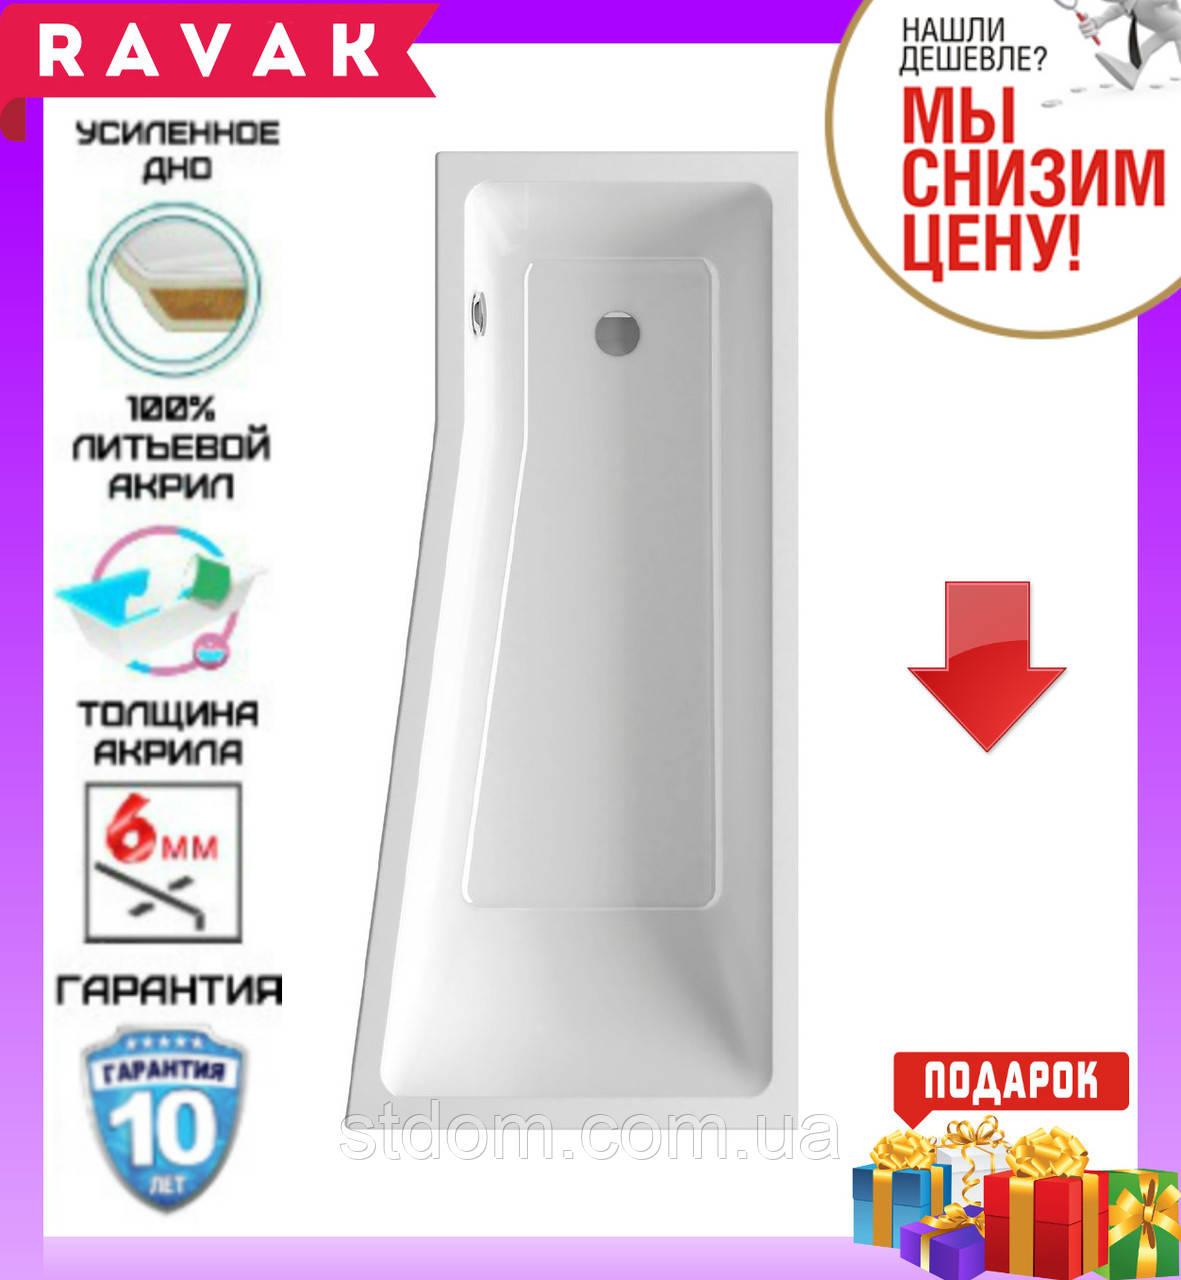 Акриловая ванна 160x75 см Ravak Be Happy II C971000000 правосторонняя